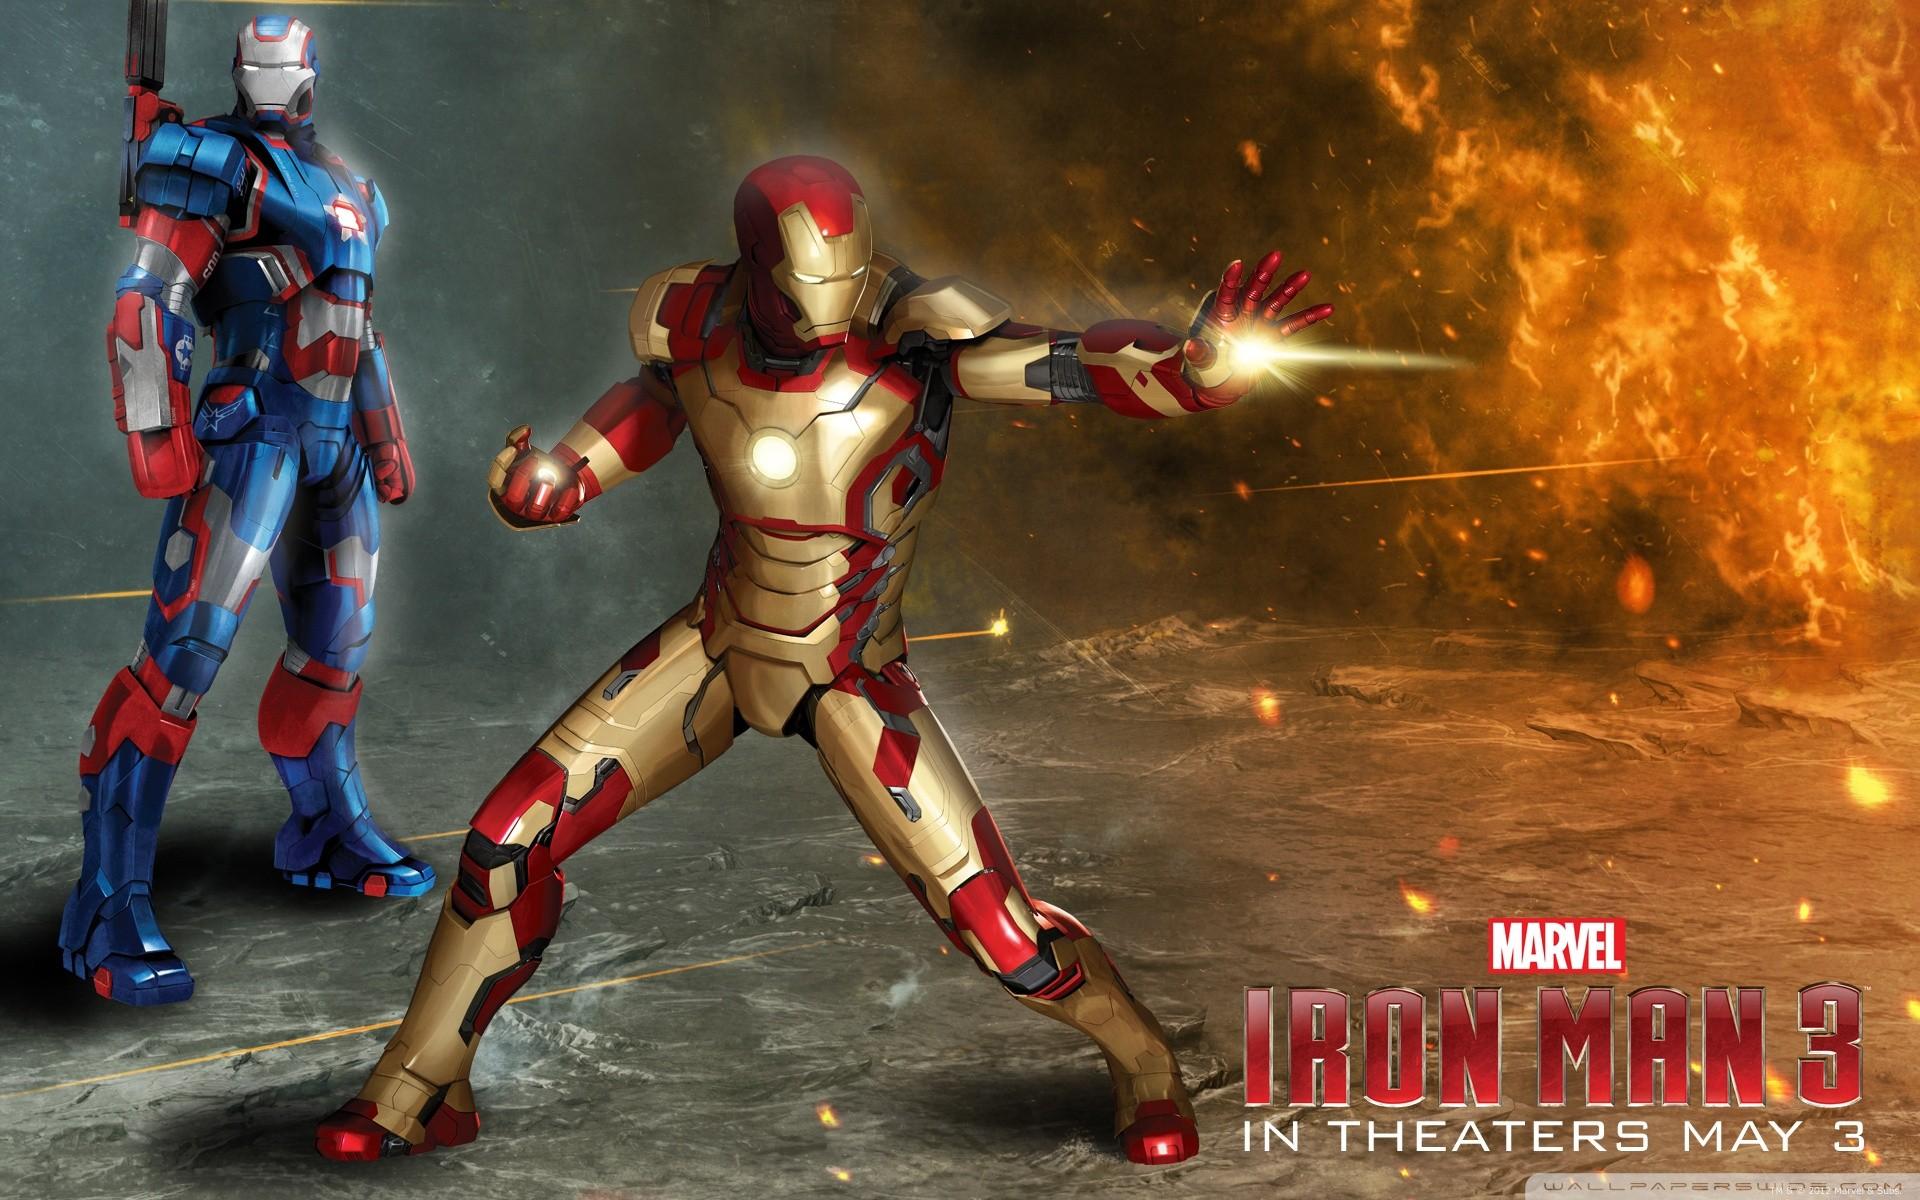 General 1920x1200 Iron Man 3 Iron Patriot Iron Man